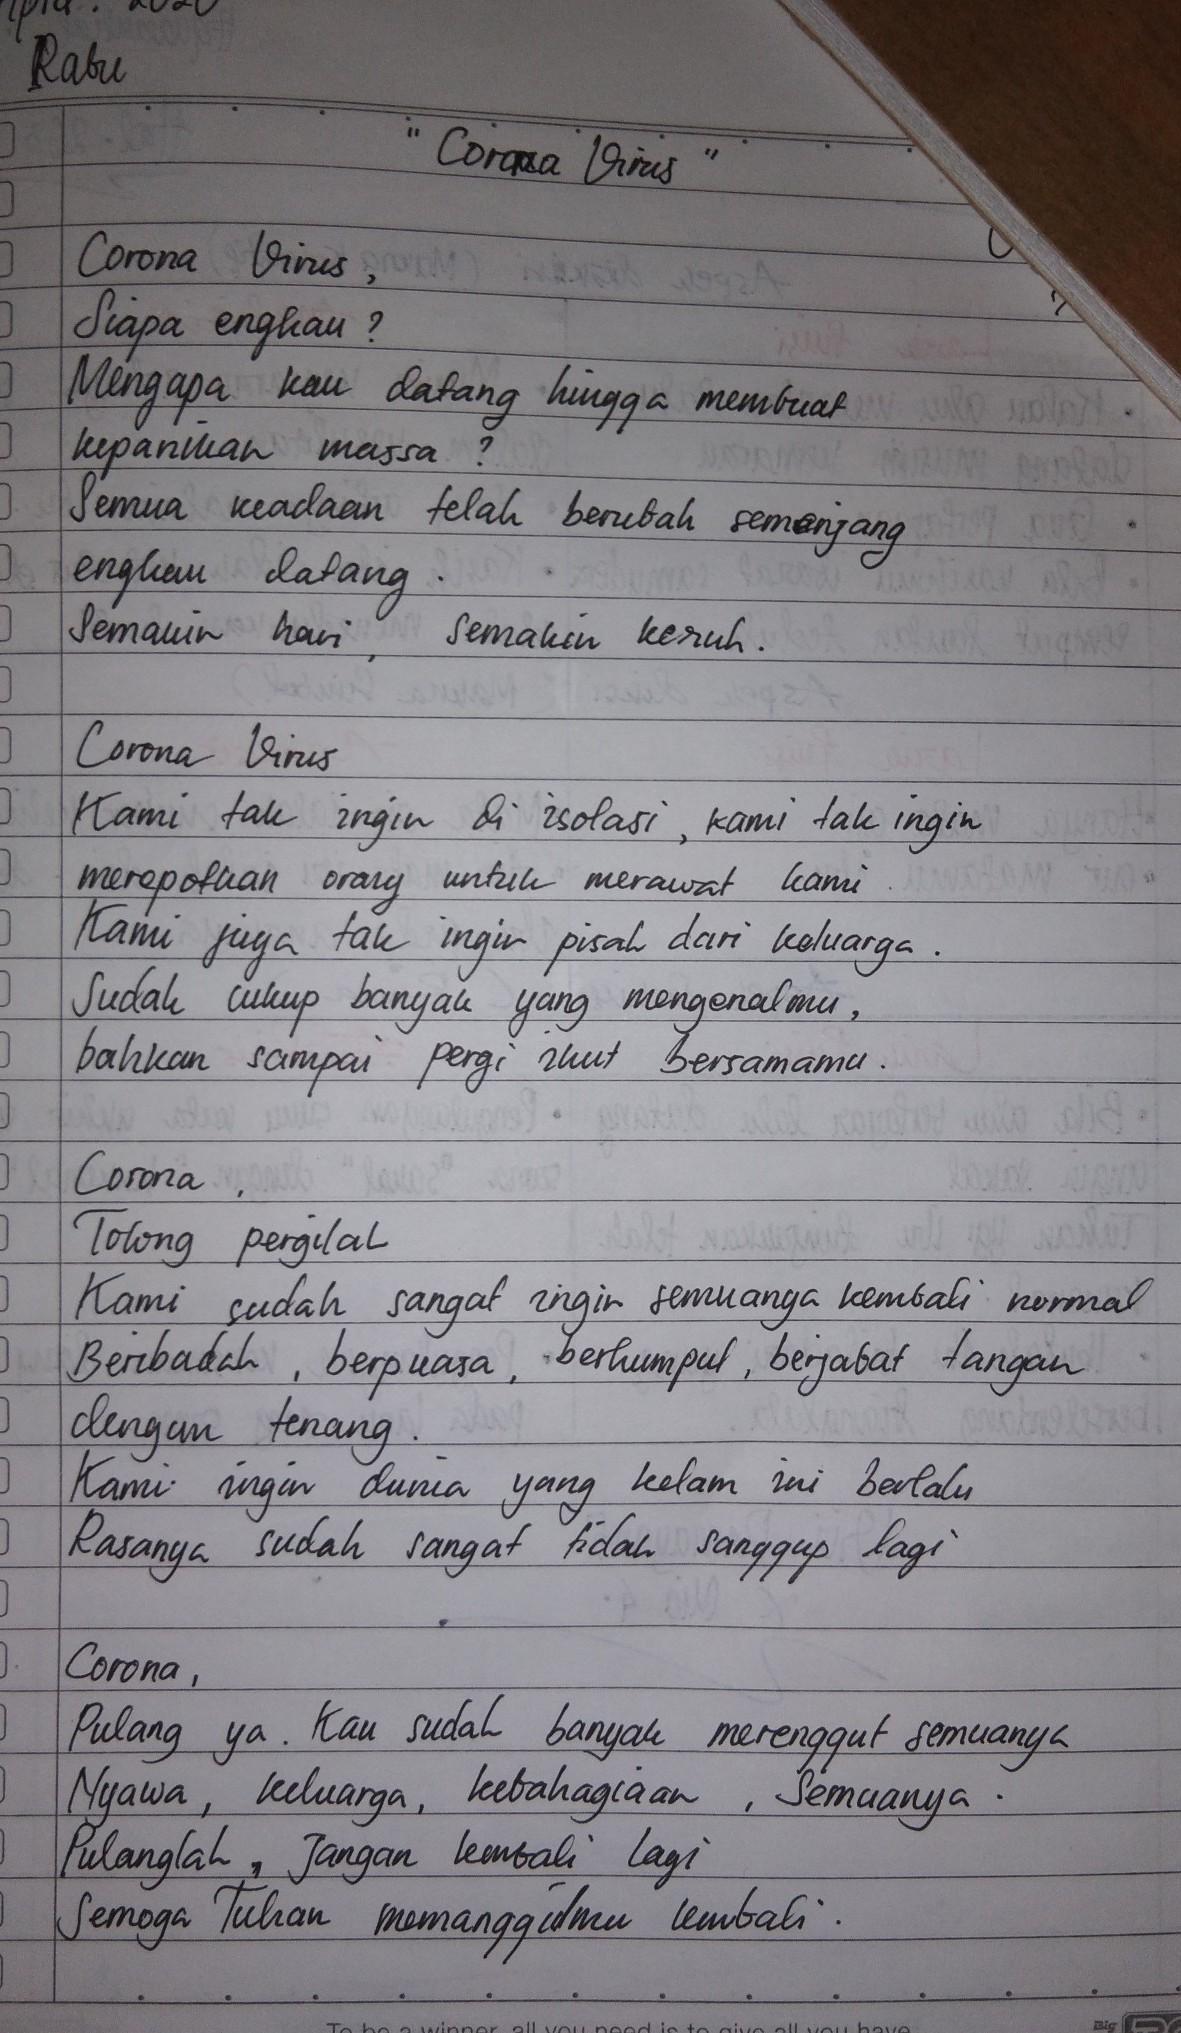 Contoh Puisi Tentang Corona Covid 19 3 Bait Aja Brainly Co Id